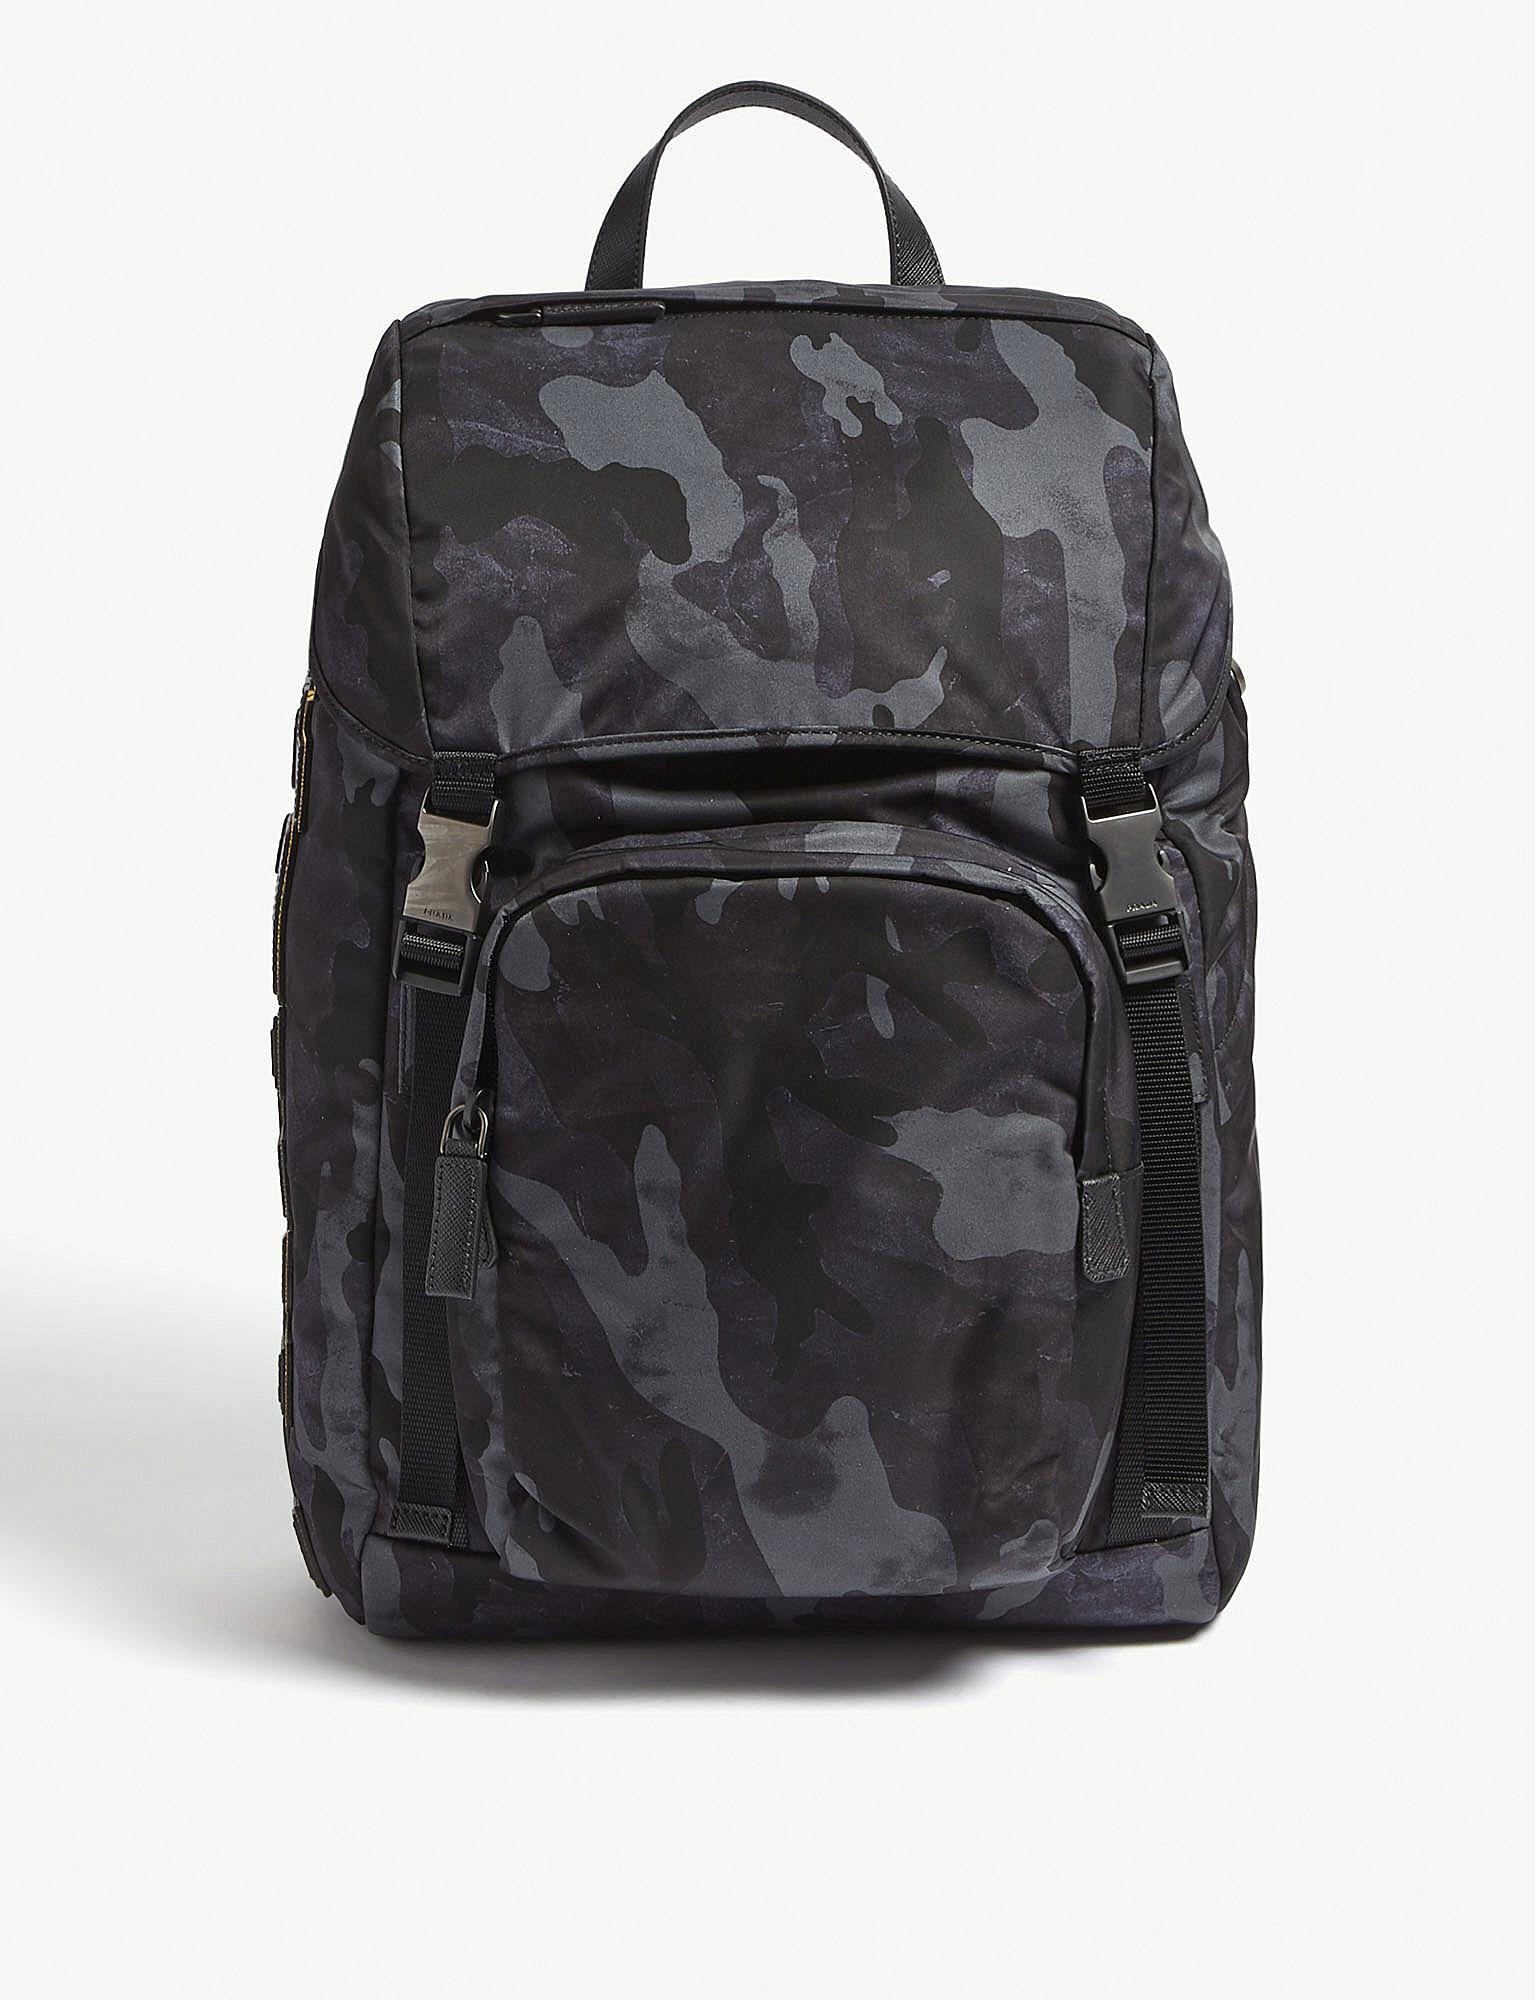 e82ea33efadd2a ... where to buy prada. mens navy blue camouflage backpack 822a4 63ff8 ...